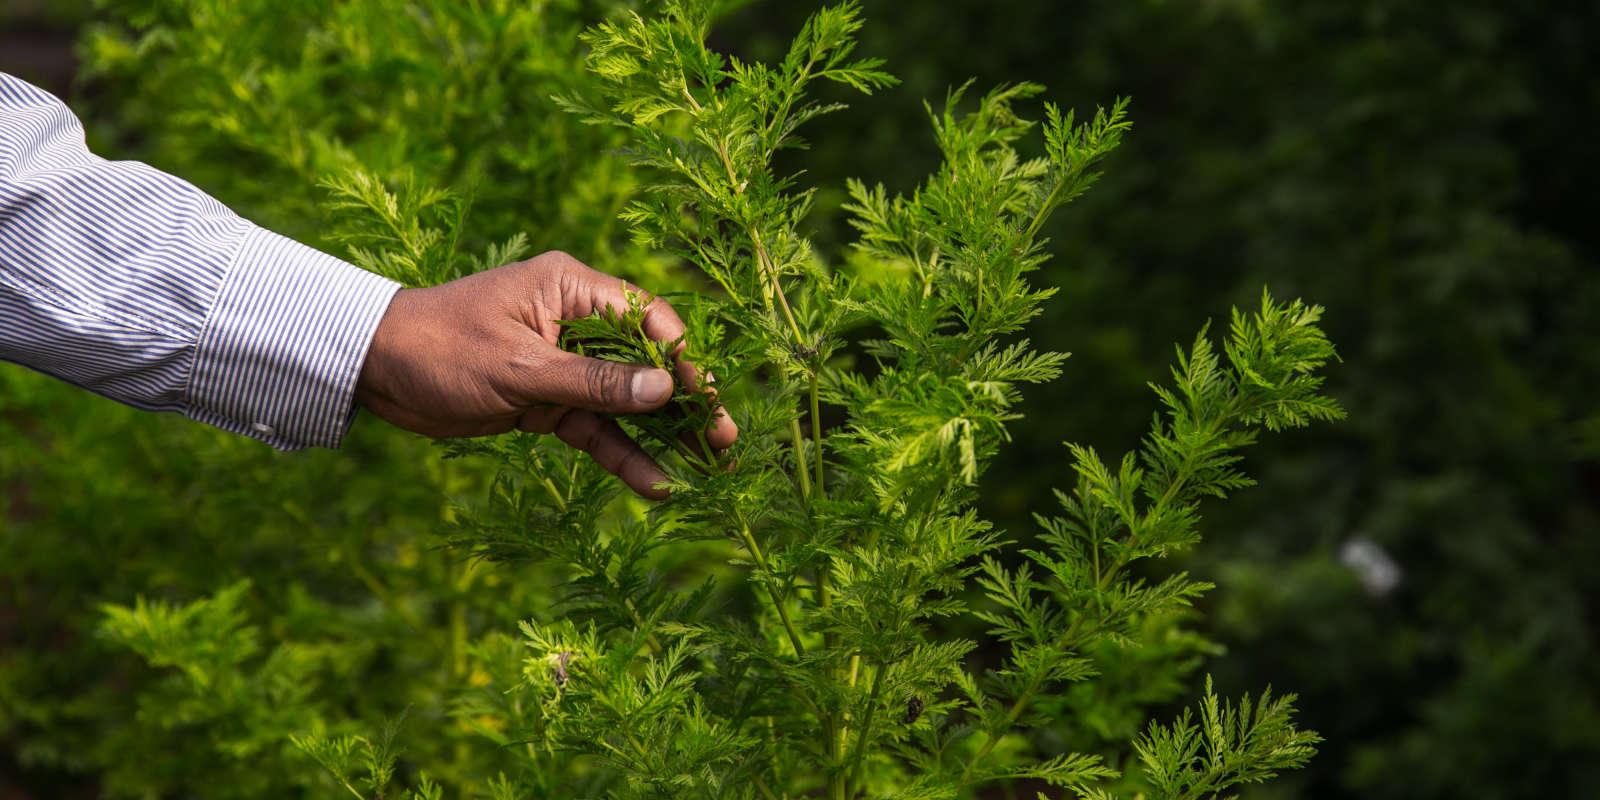 Un plan d'Artemisia annua cultivé àFaharetana, près d'Antananarive le 19 mai 2020.